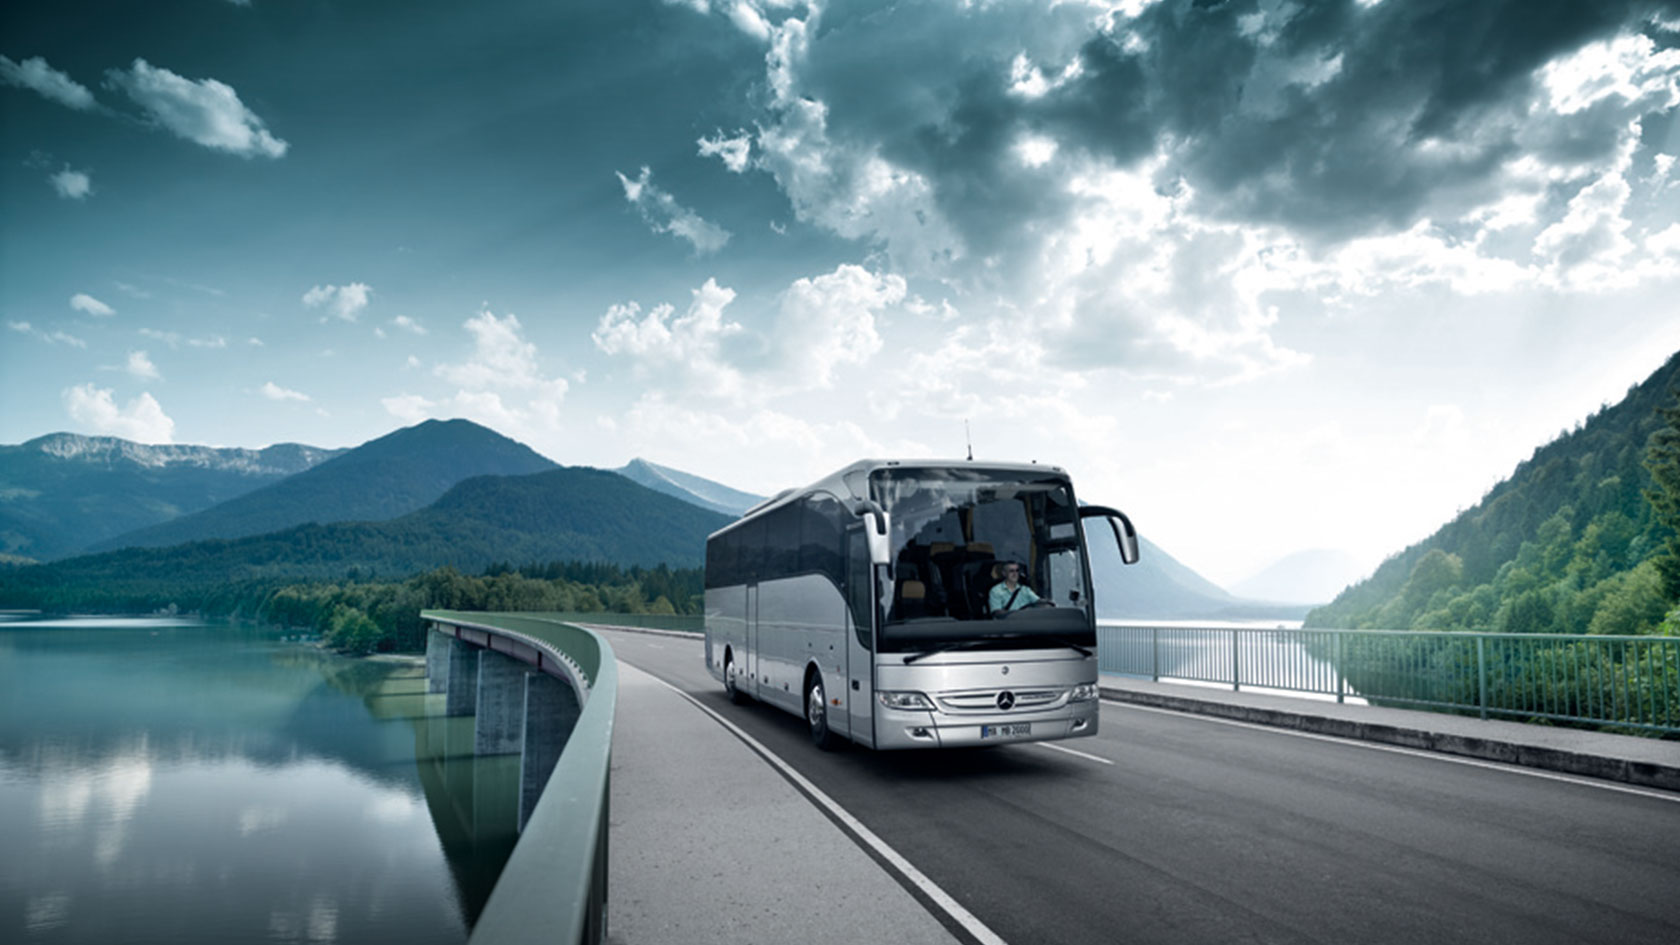 Плюсы и минусы путешествия на автобусе